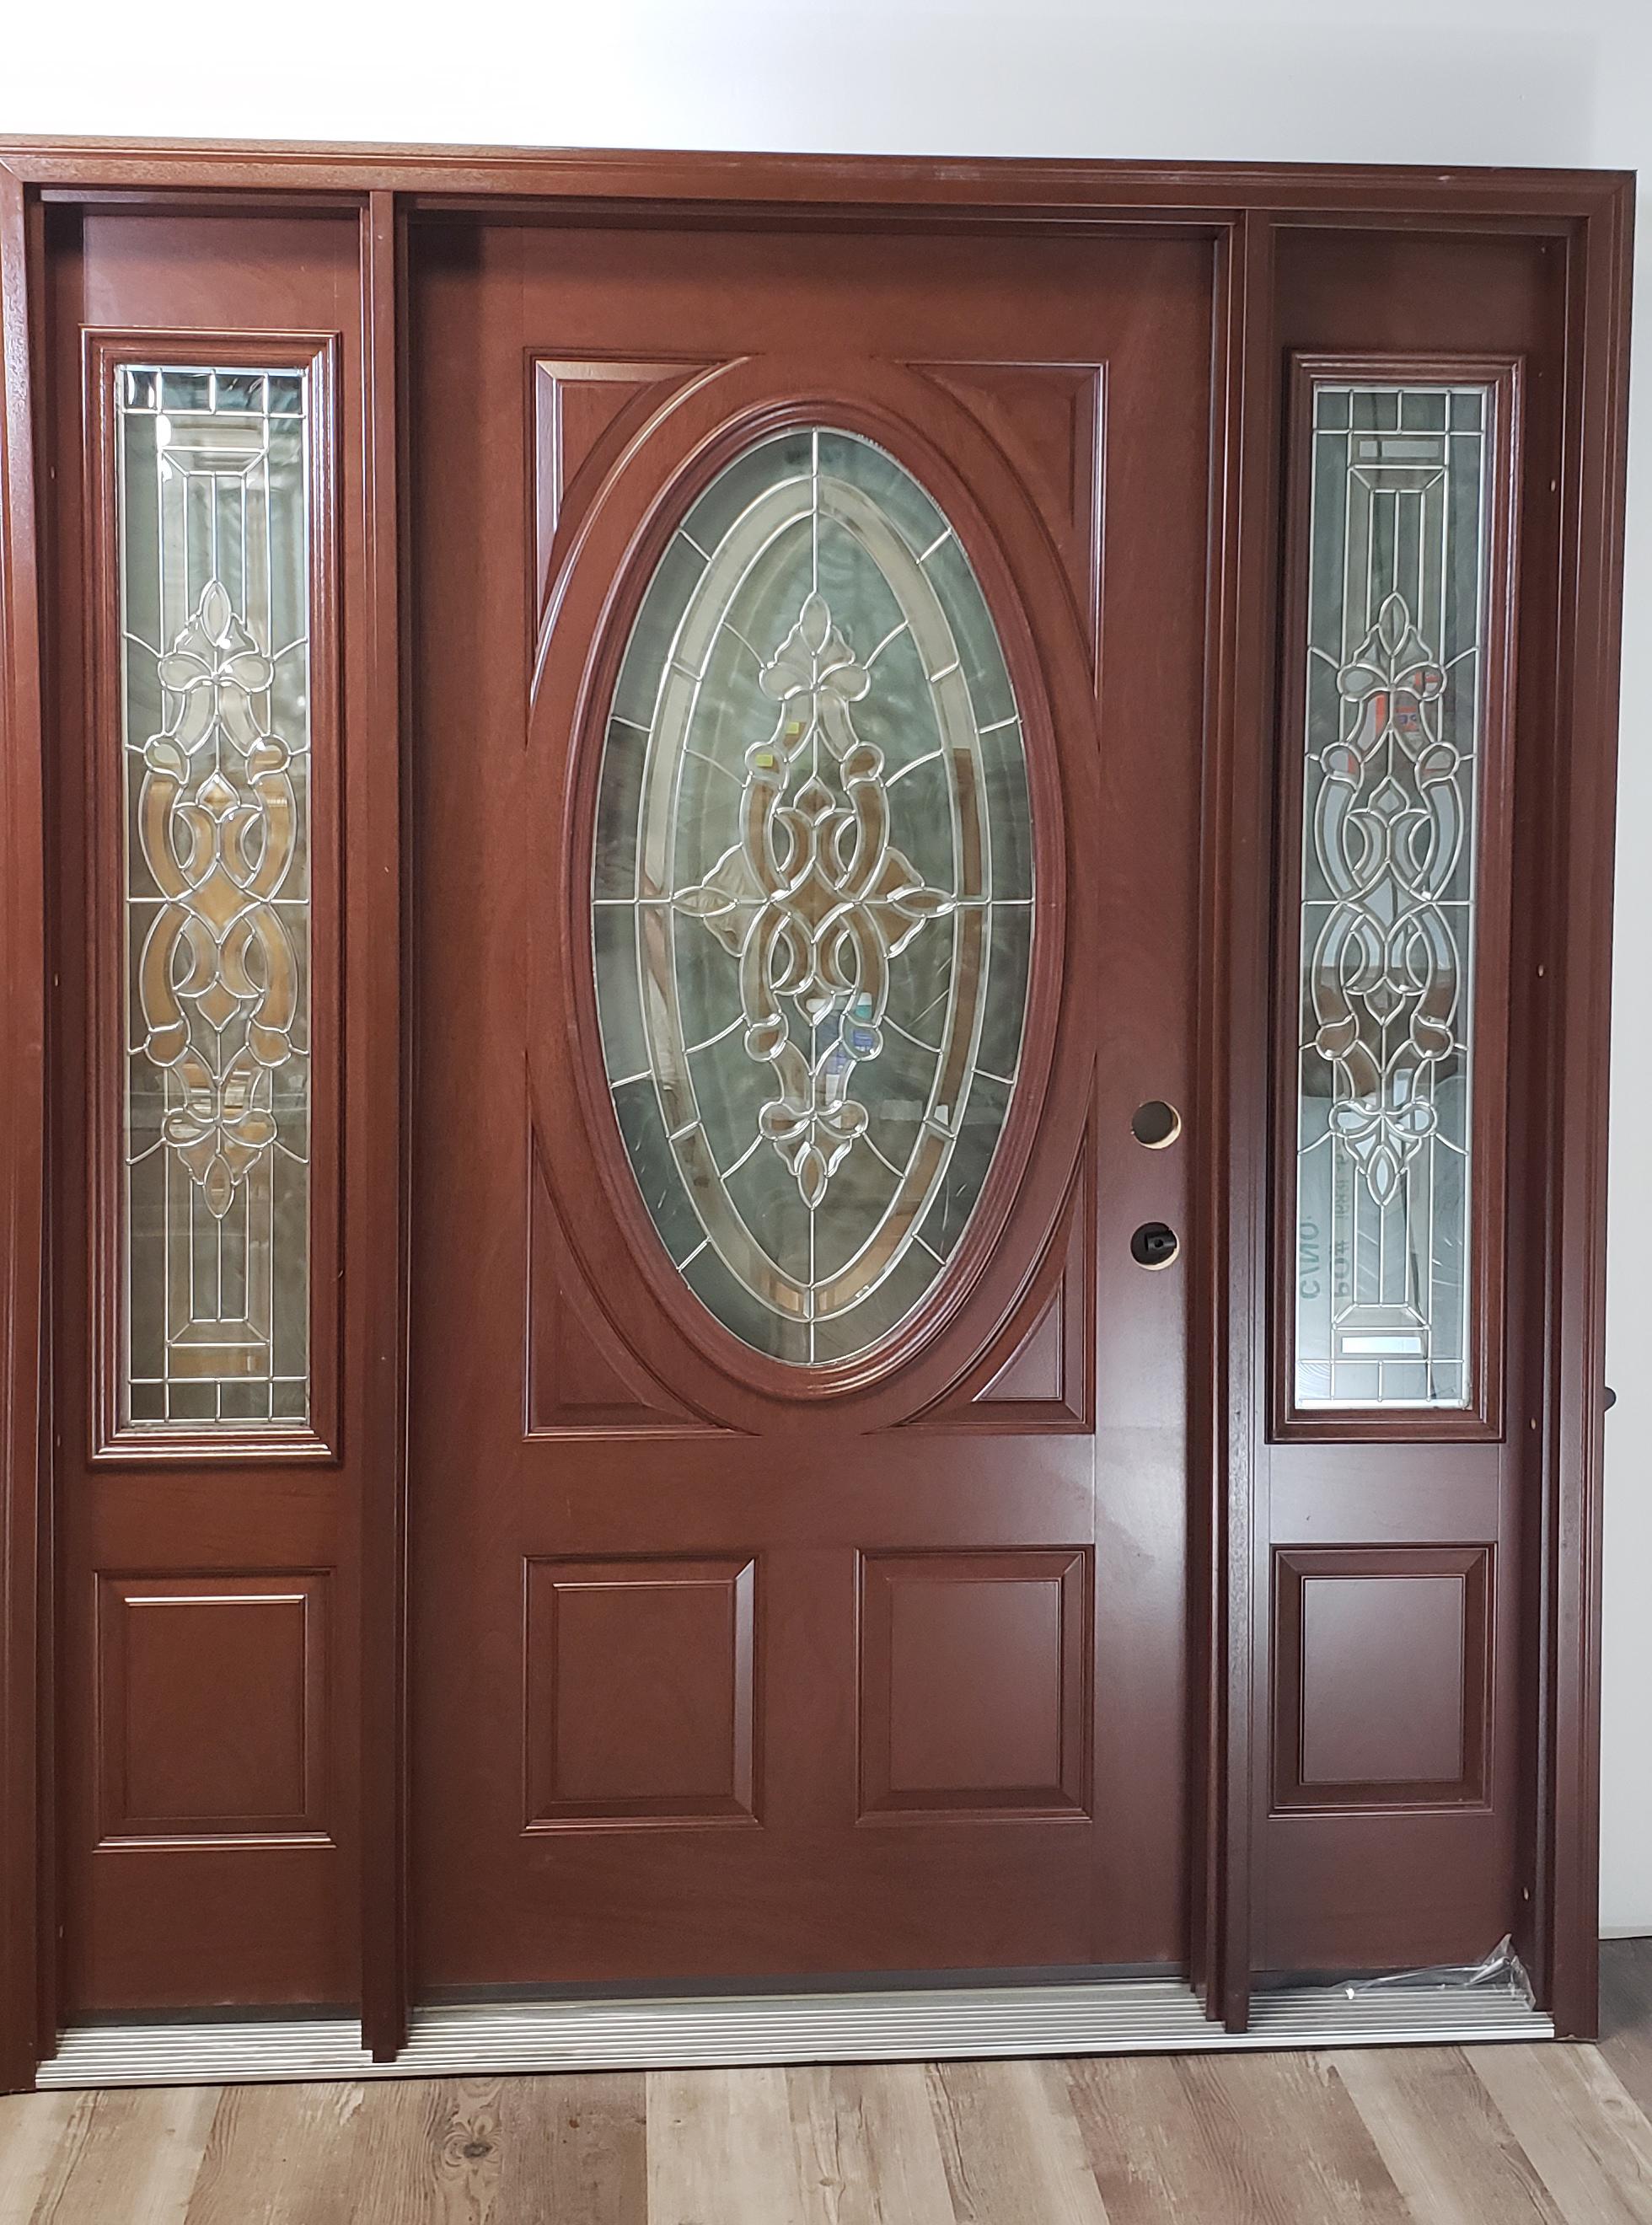 fiberglass-entry-oval-glass-sidelights-exterior-door-dark-finish